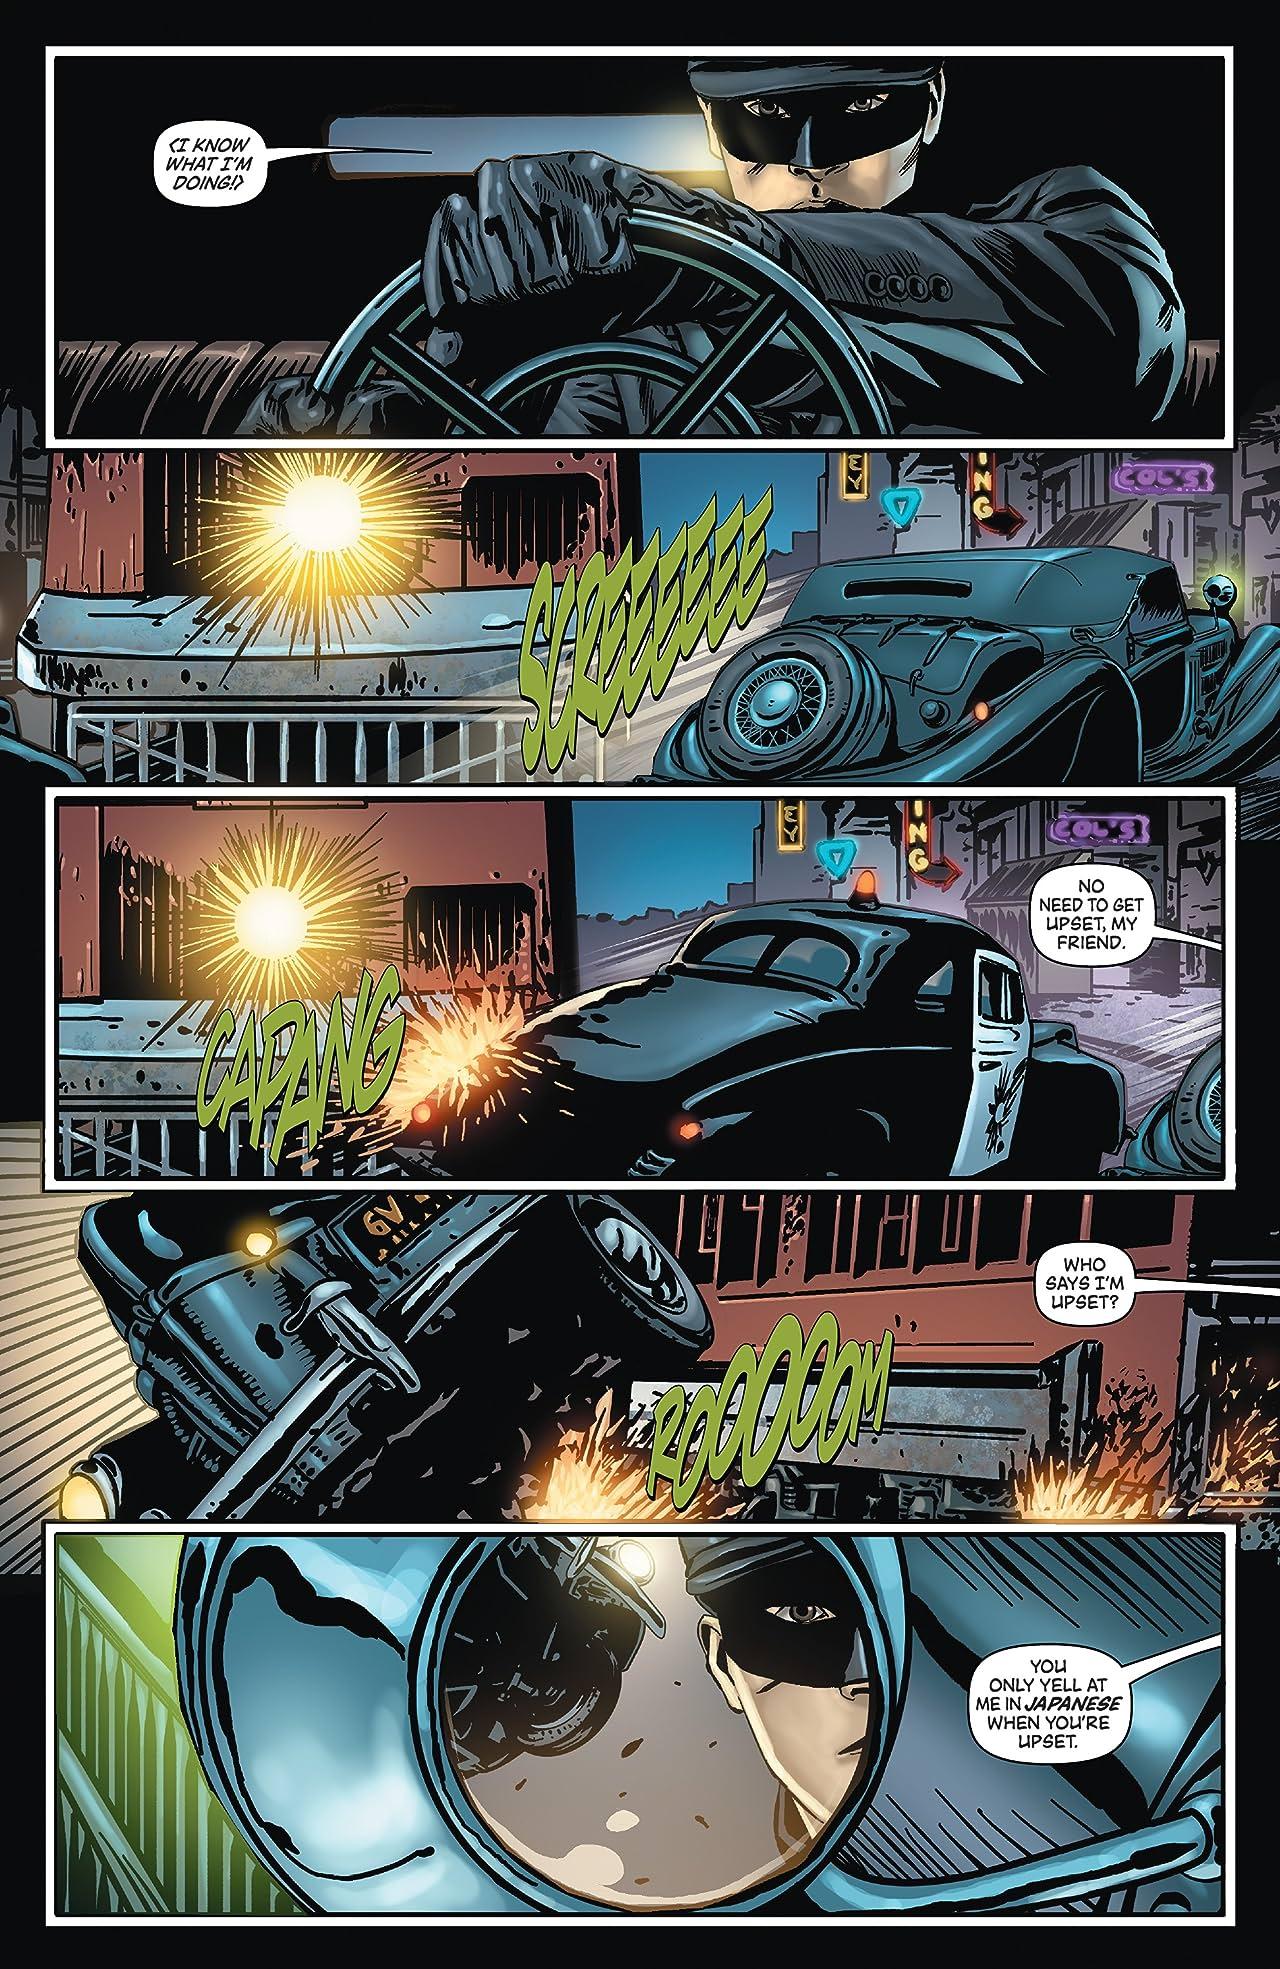 Kato Origins: Way of the Ninja #1: Preview